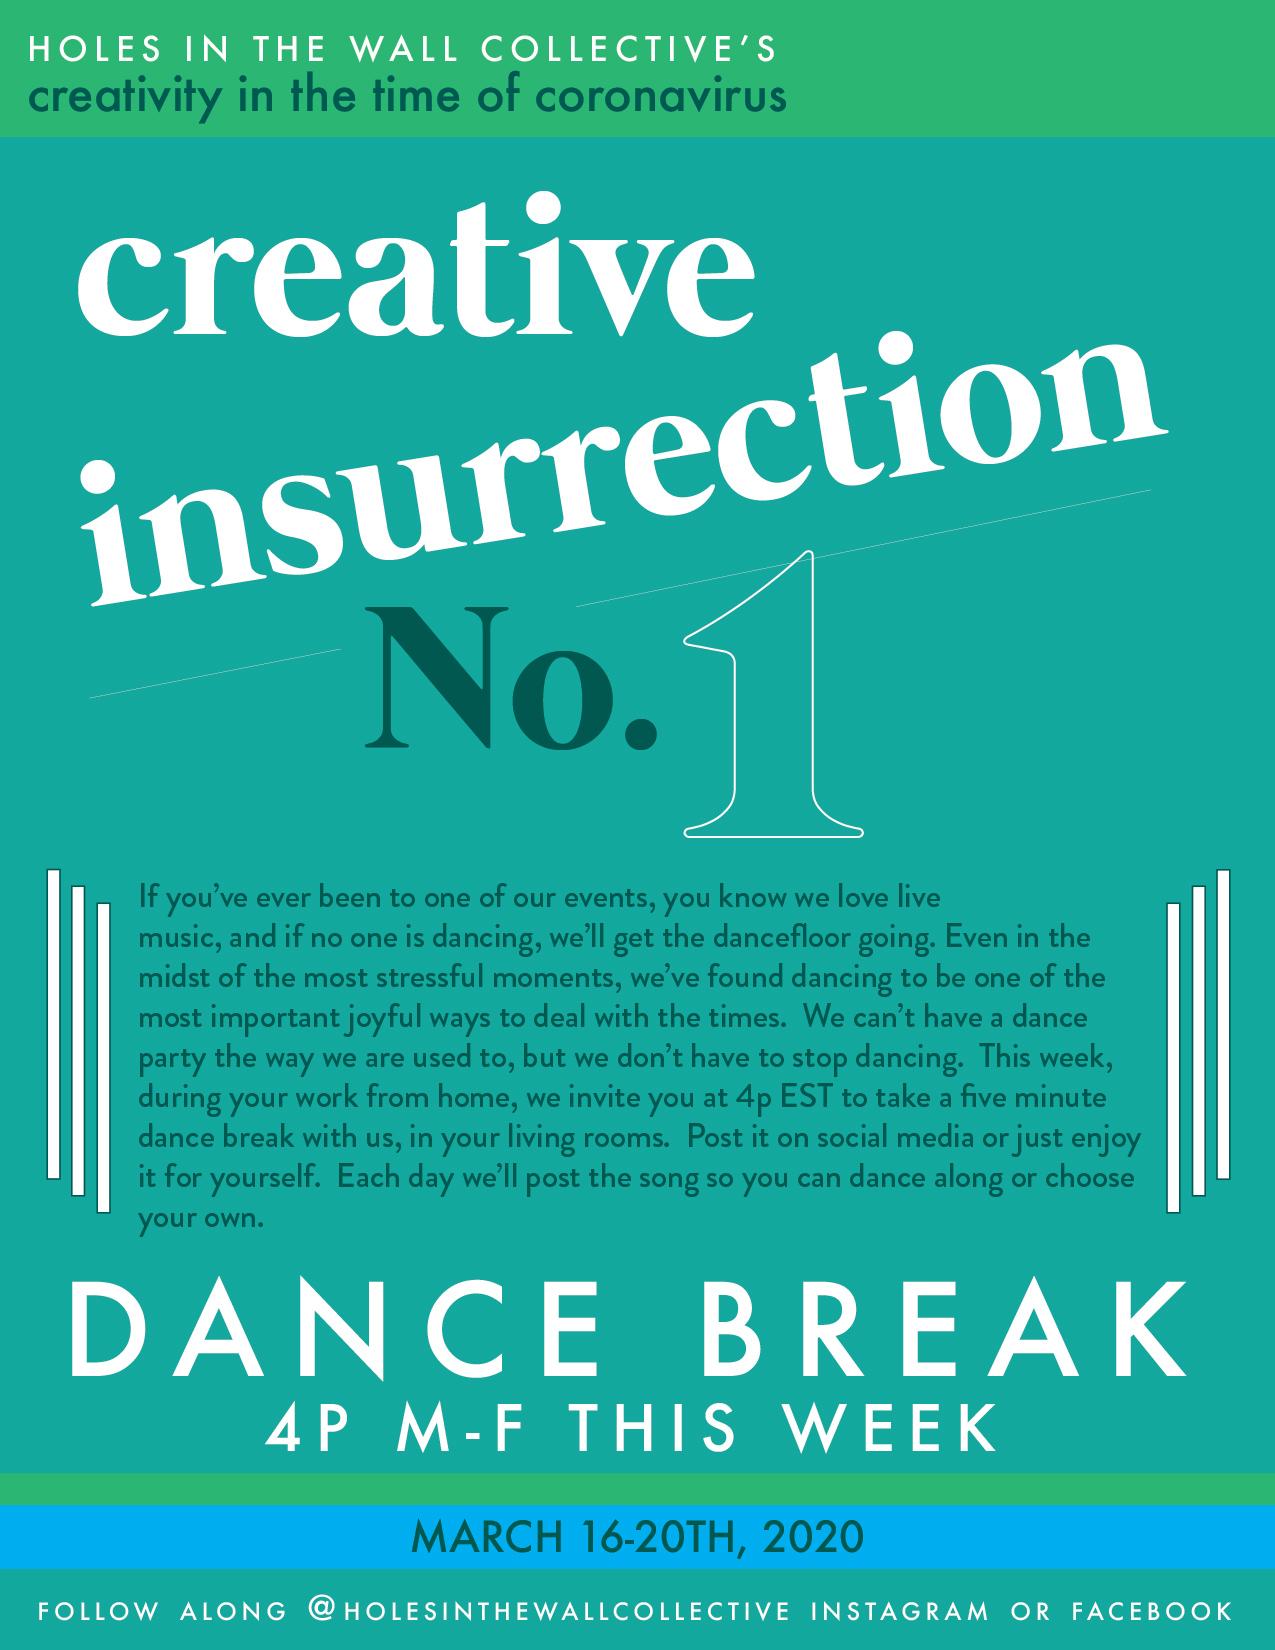 Creative Insurrection No. 1